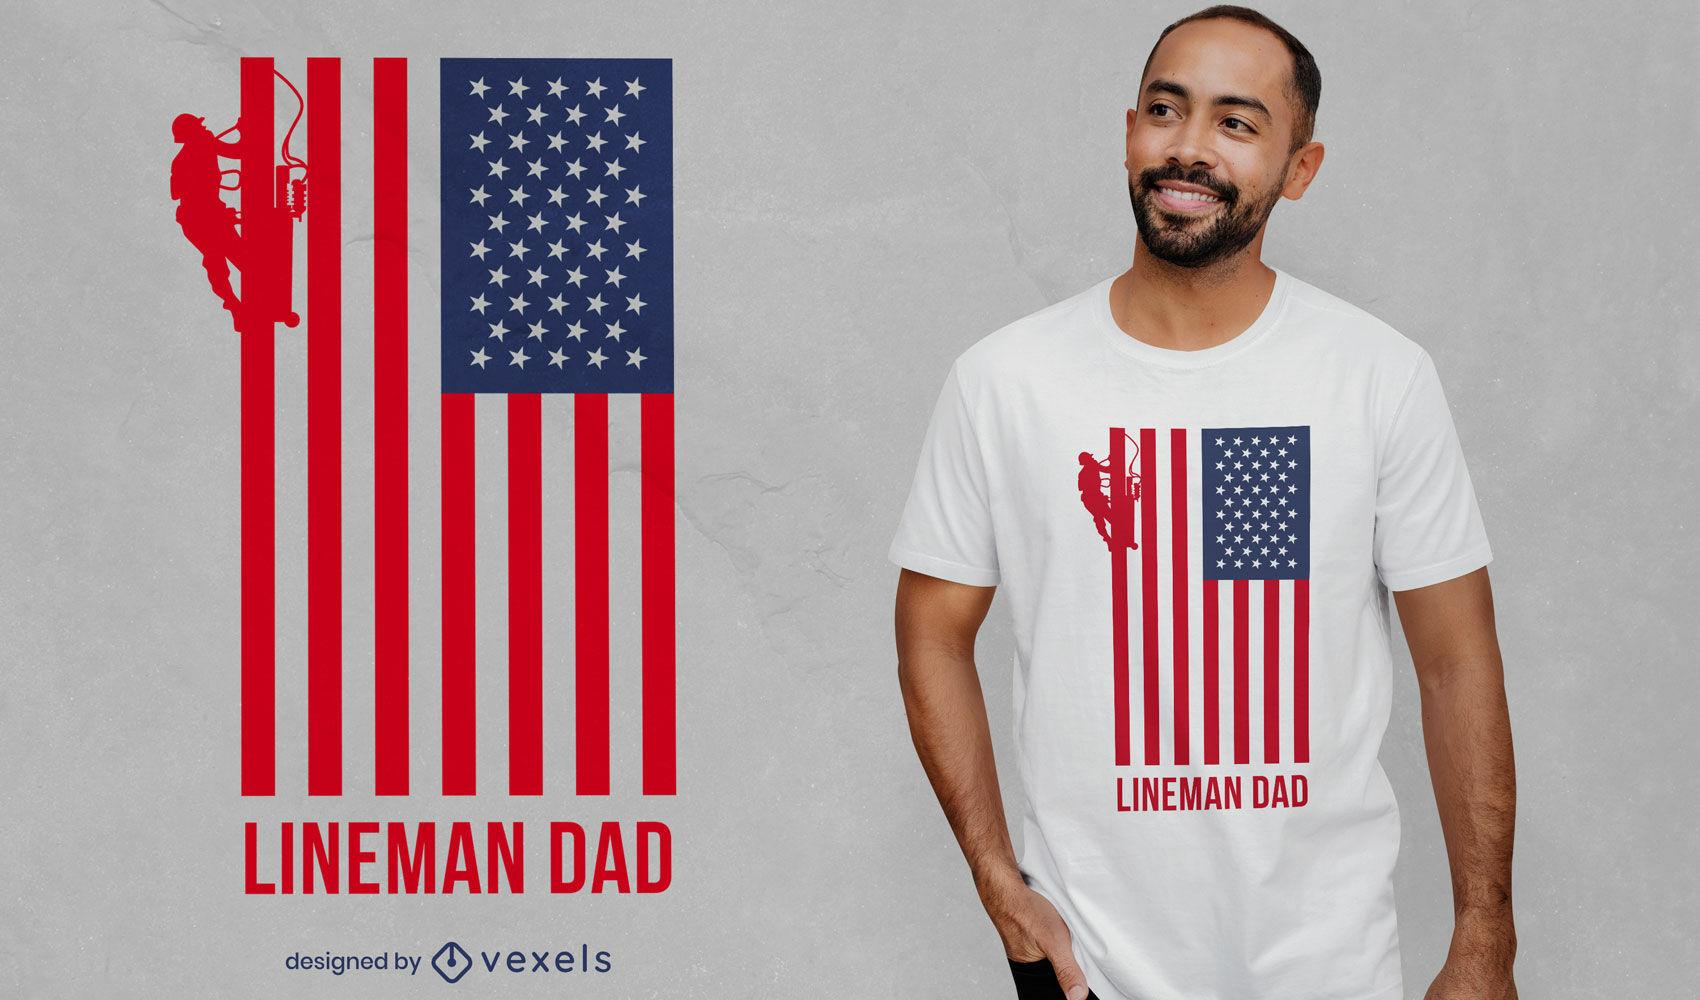 Lineman dad american flag t-shirt design